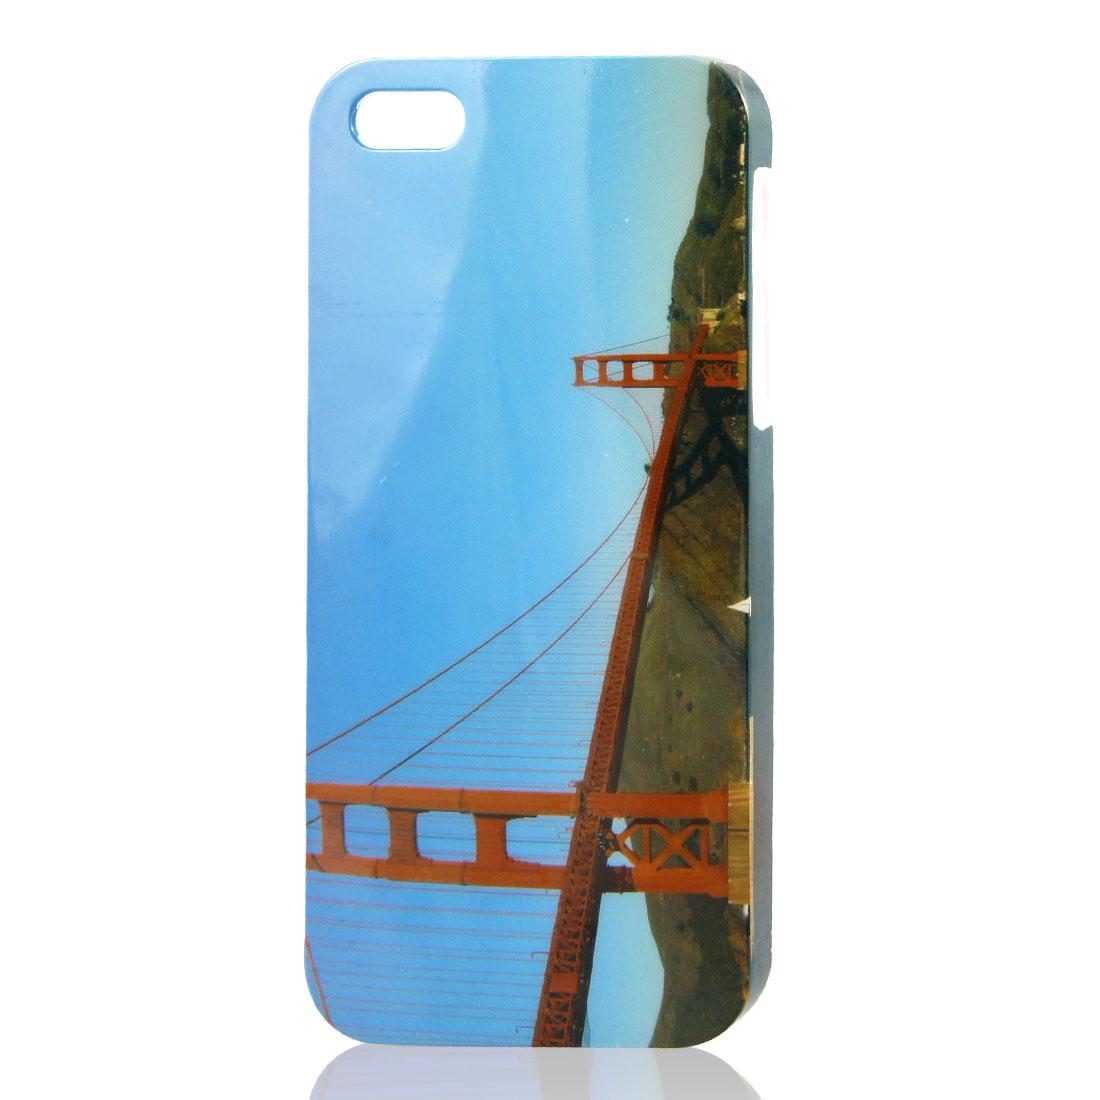 Golden Gate Bridge Design IMD Hard Back Case Cover for iPhone 5 5G